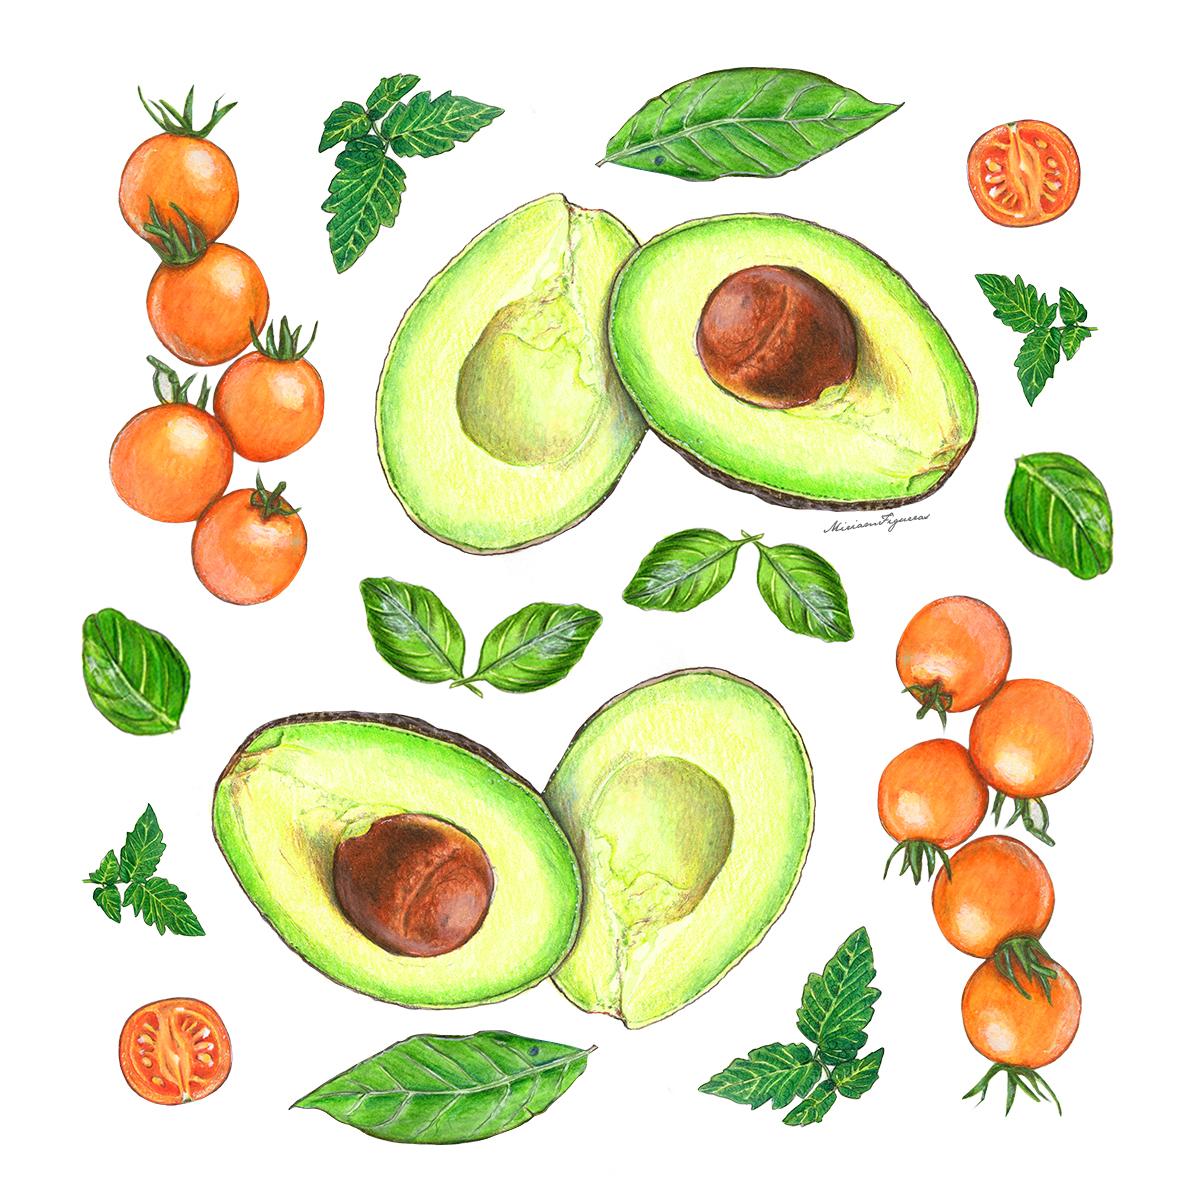 AvocadoTomatoes_square.jpg